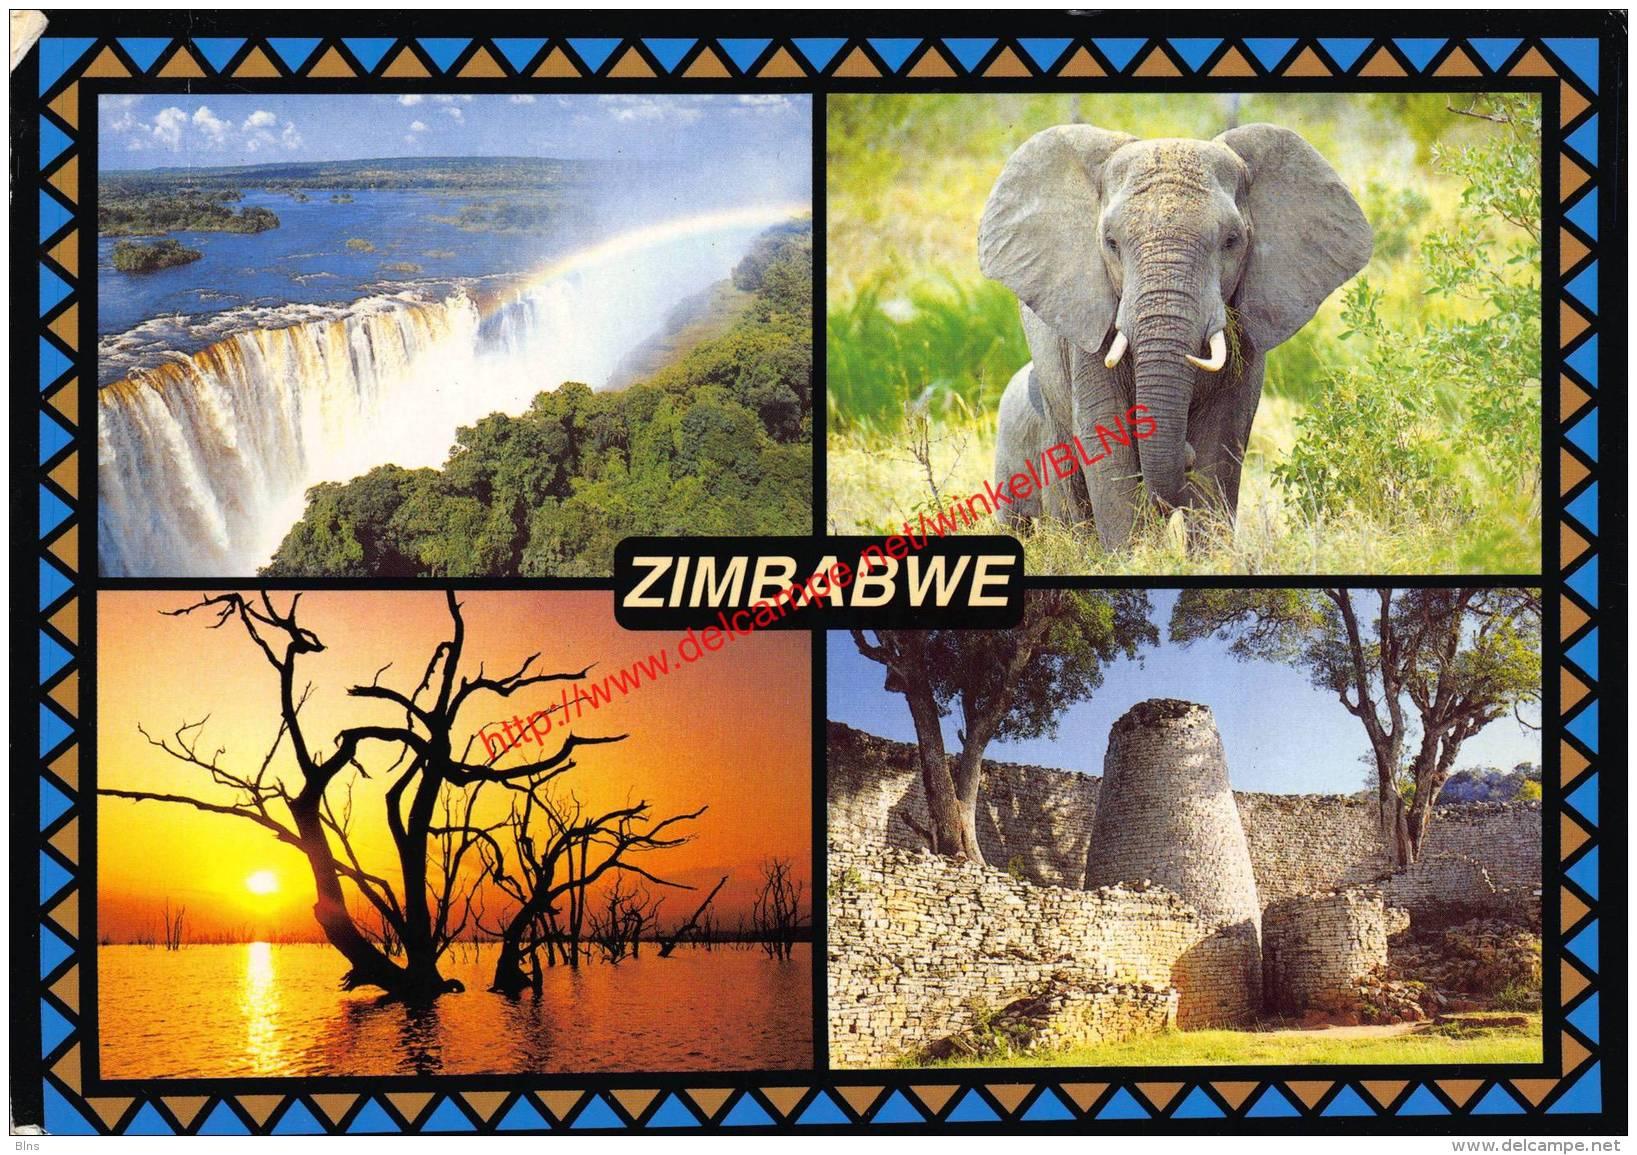 Victoria Falls - Zimbabwe - Zimbabwe